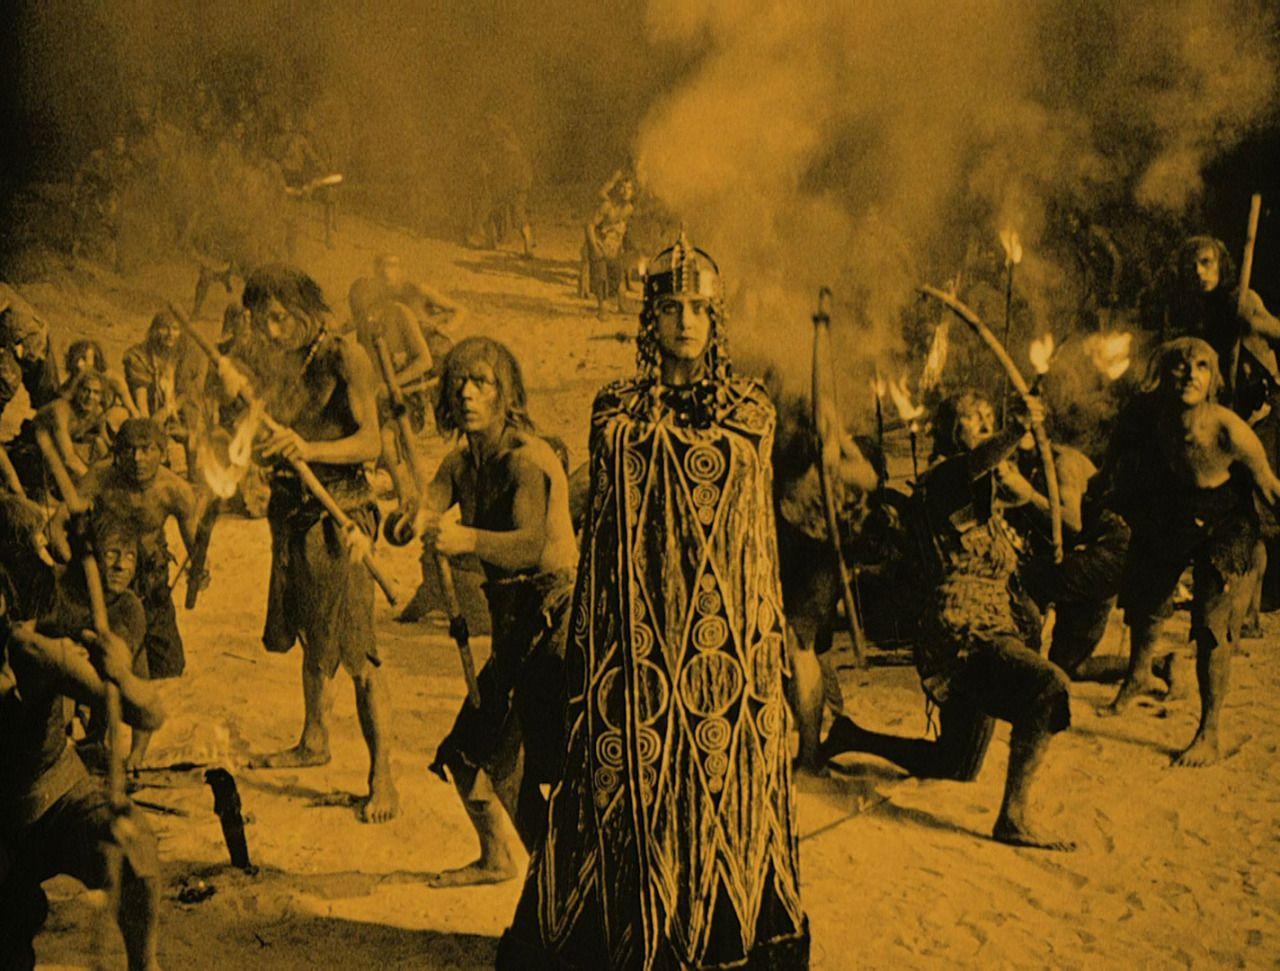 Kriemhild (Margarete Schön) in the midst of the climactic battle in Kriemhild's Revenge (1924)